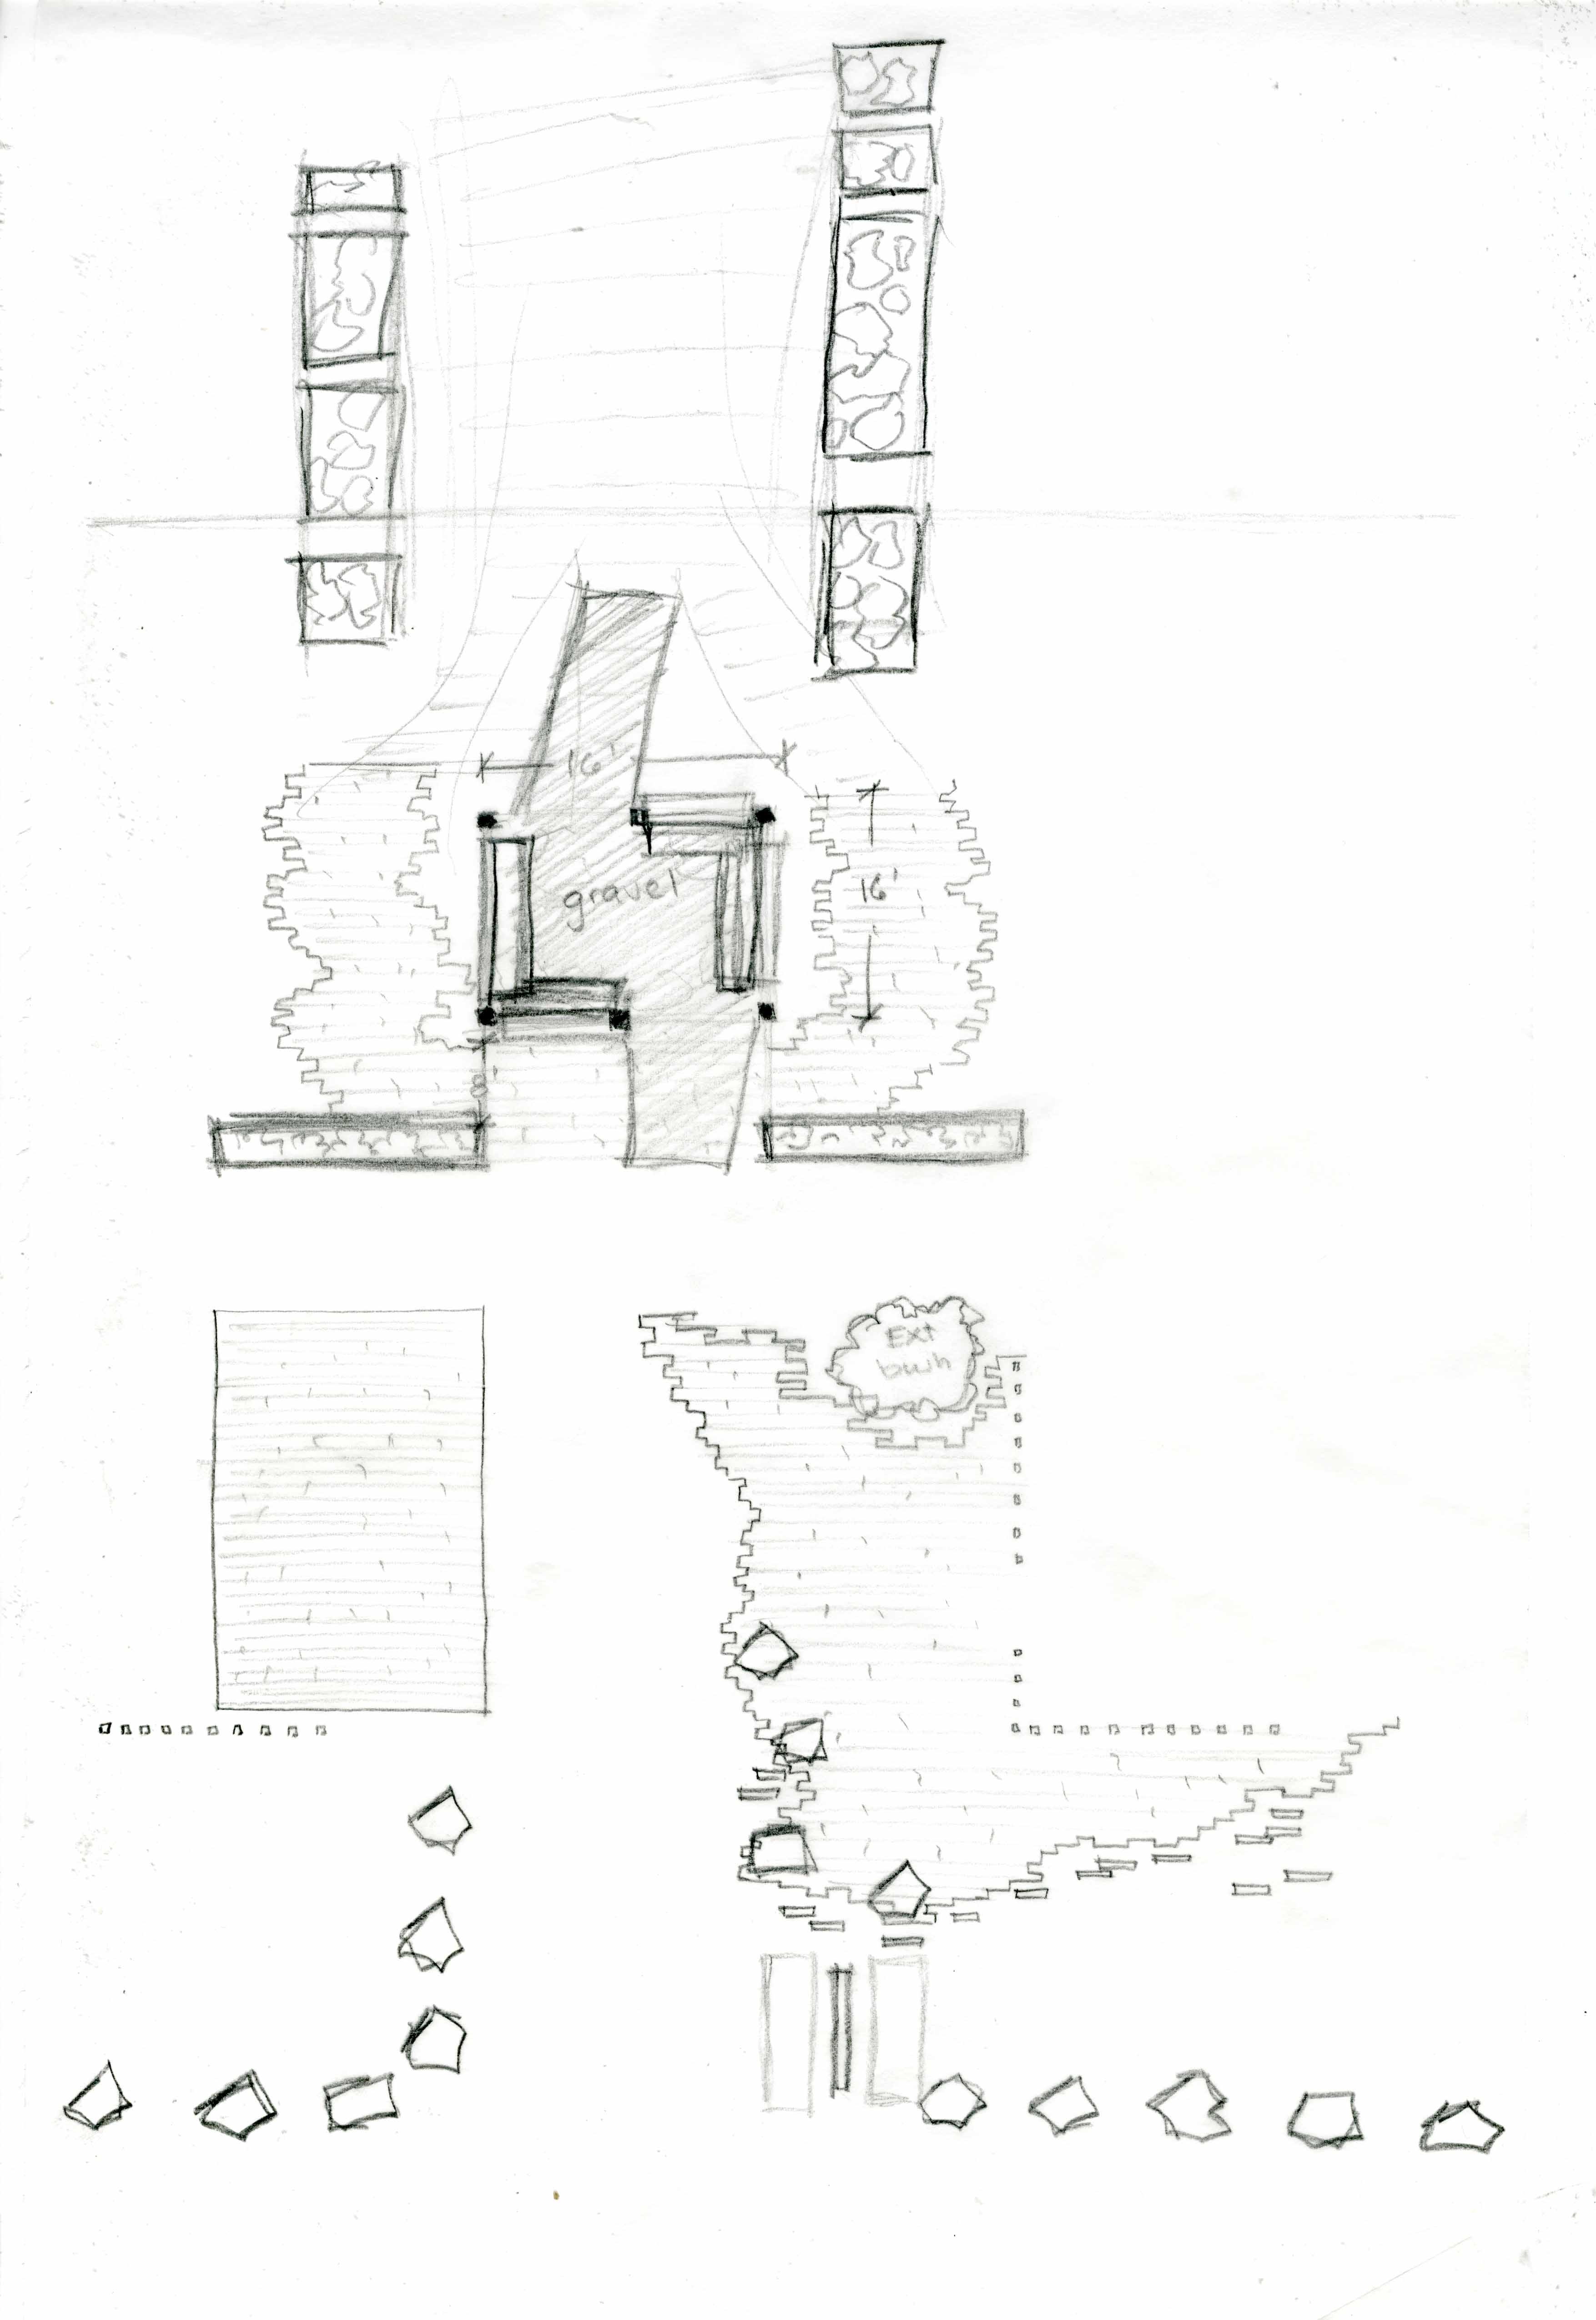 Basic Schematic Exploration